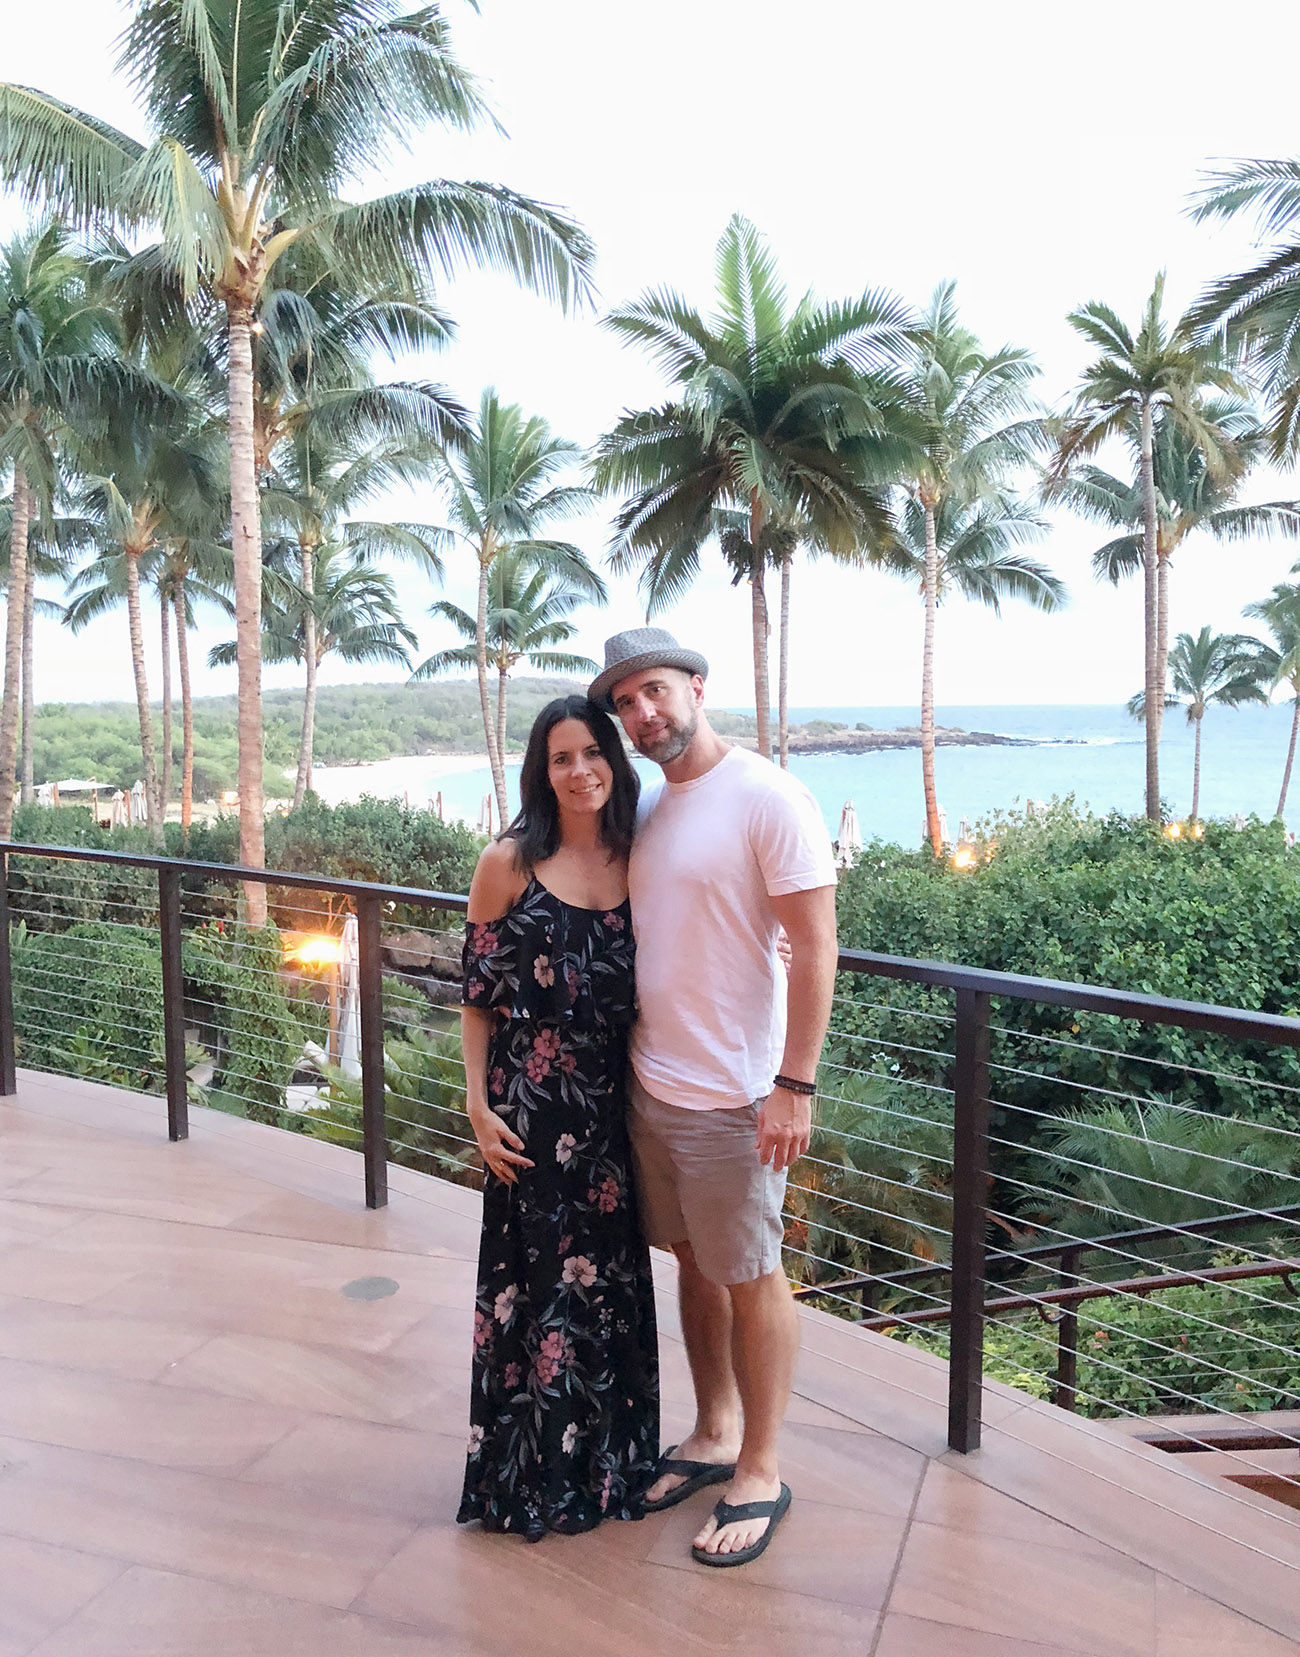 Lanai Four Seasons for your Honeymoon